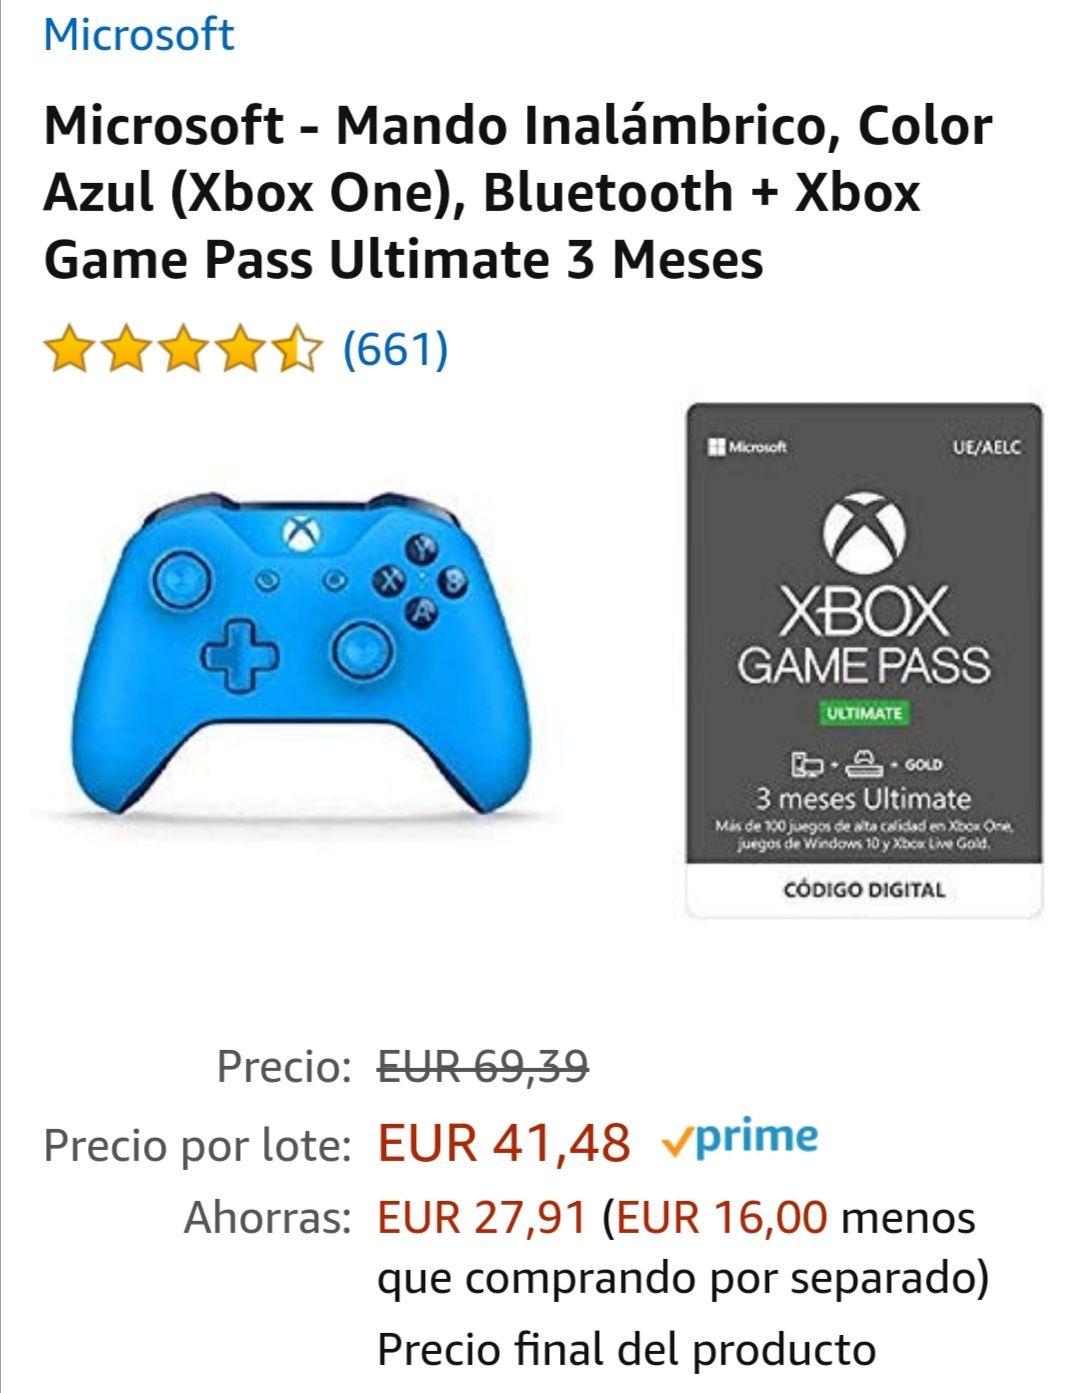 Mando Xbox One Inalámbrico, Color Azul, Bluetooth + Xbox Game Pass Ultimate 3 Meses